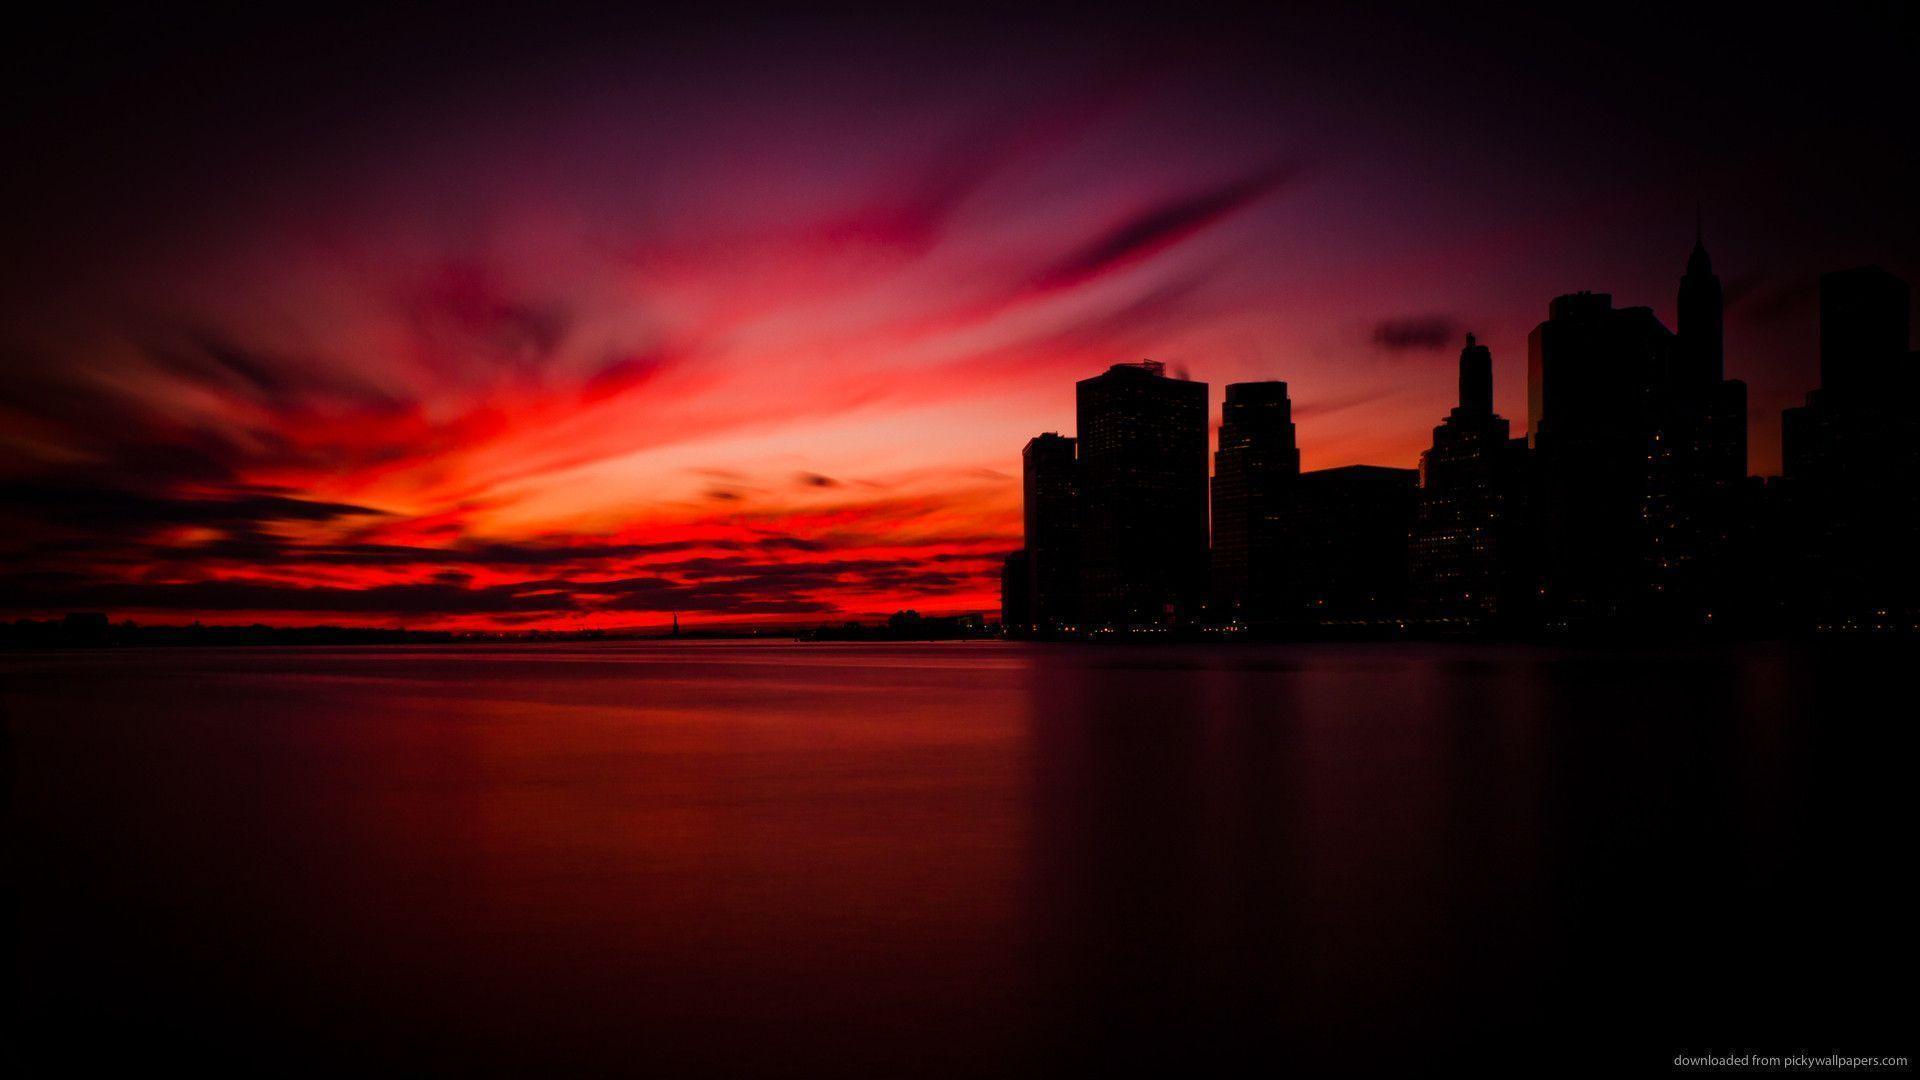 Wallpaper download nokia 5233 - Dark Manhattan Sunset Wallpaper For Nokia 5233